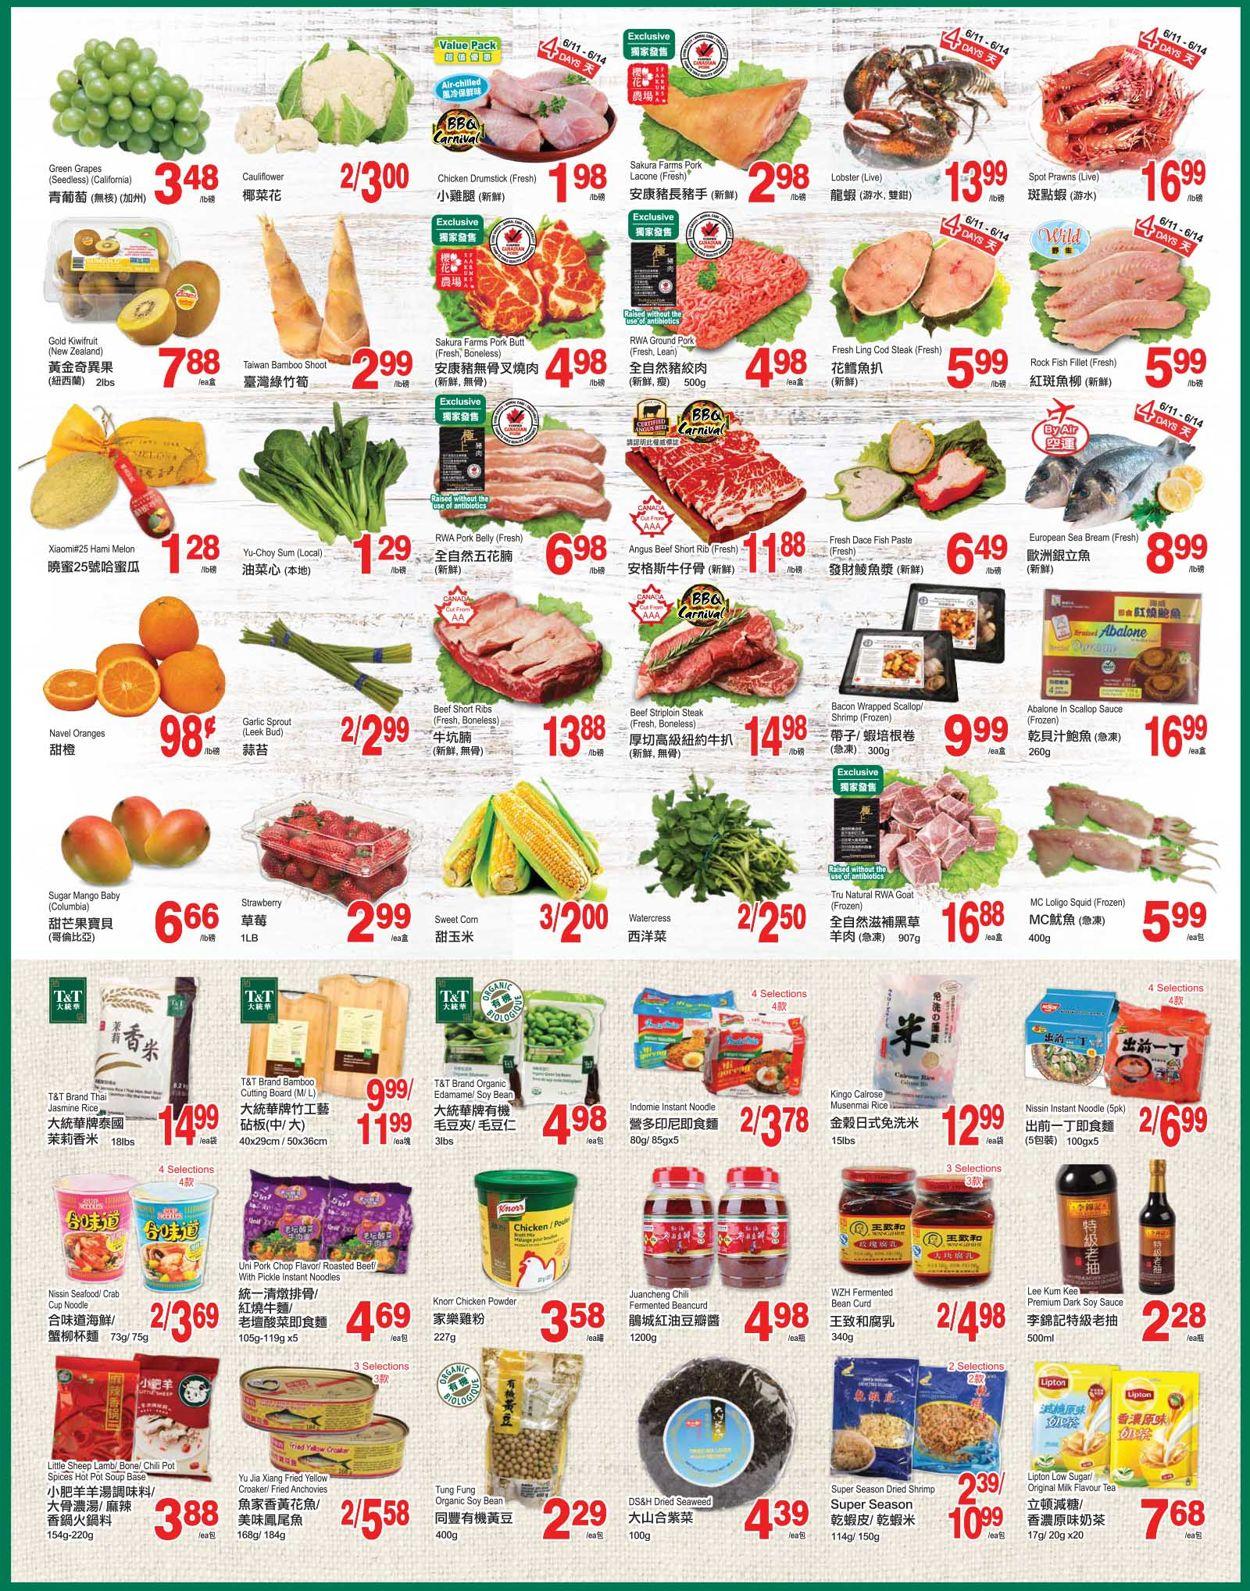 T&T Supermarket - British Columbia Flyer - 06/11-06/17/2021 (Page 2)